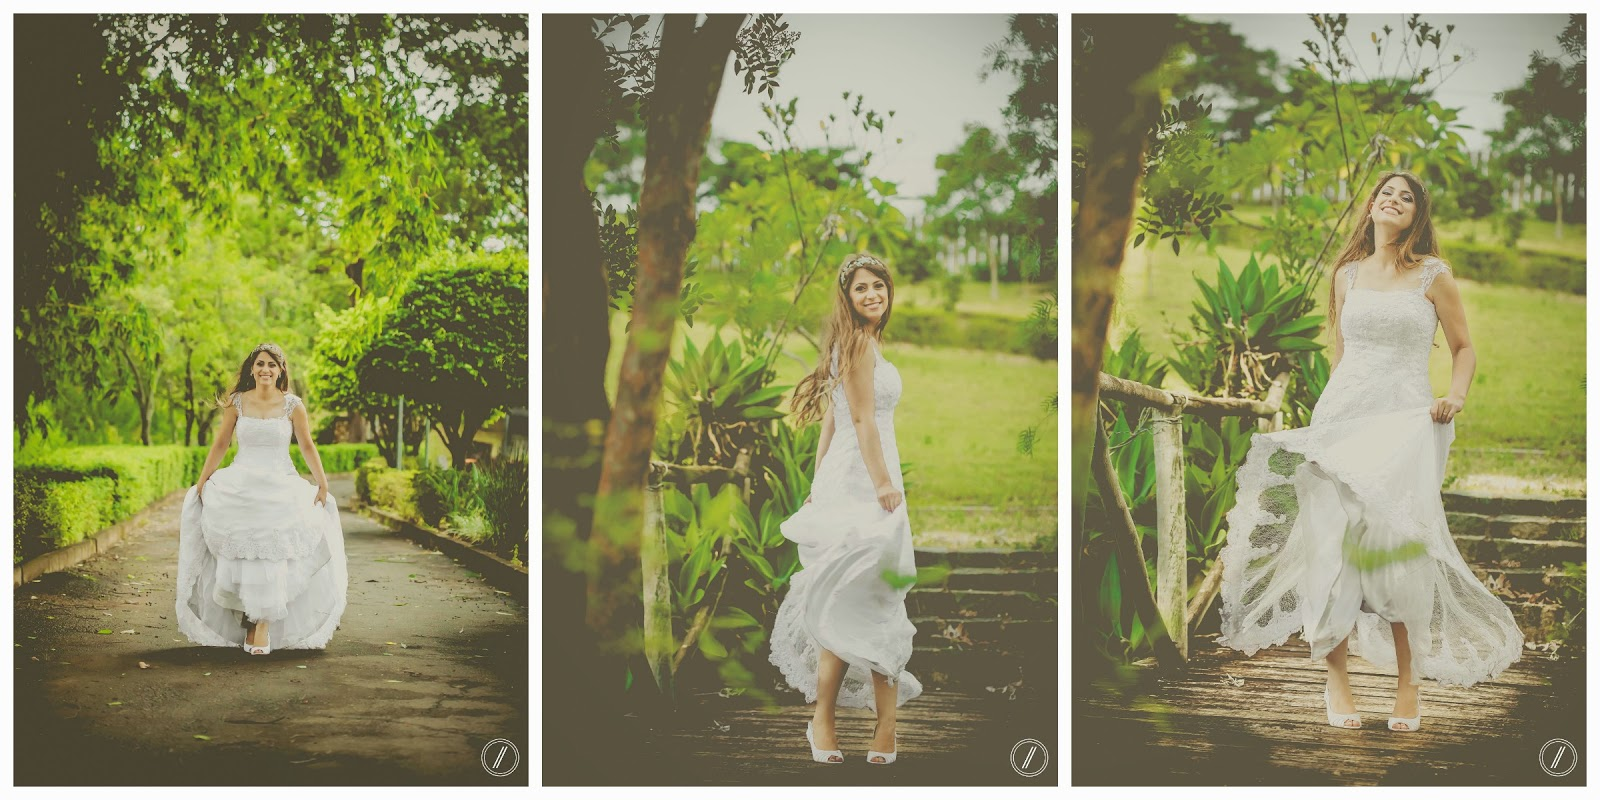 trash-dress-book-externo-natureza-paisagem-linda-bh-13